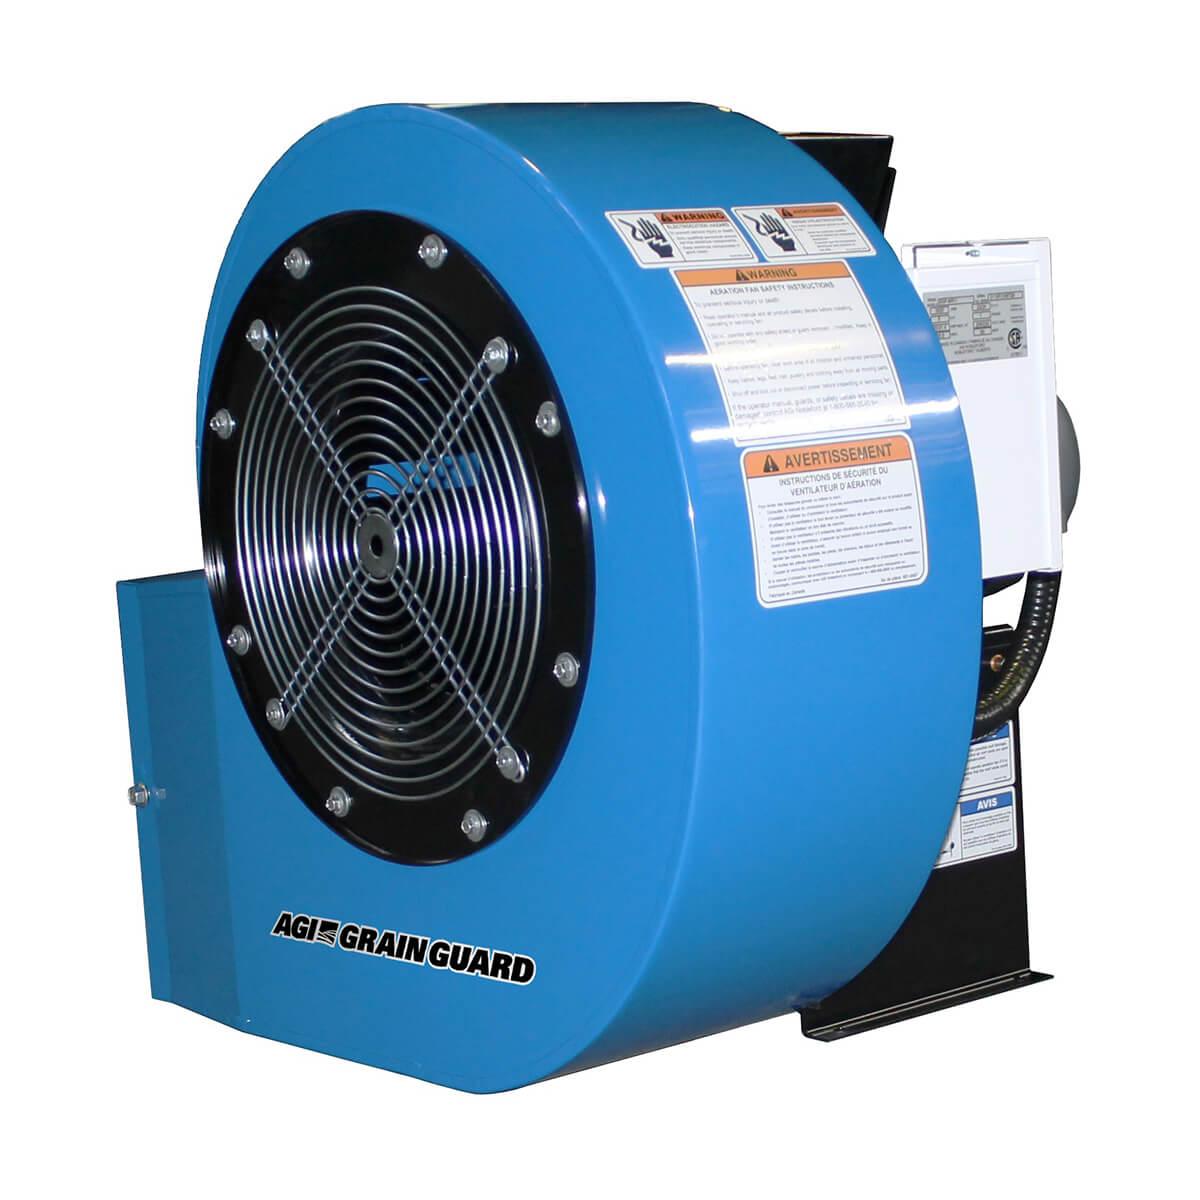 Grain Guard Grain Protection Centrifugal Fan - 5 hp- 230V